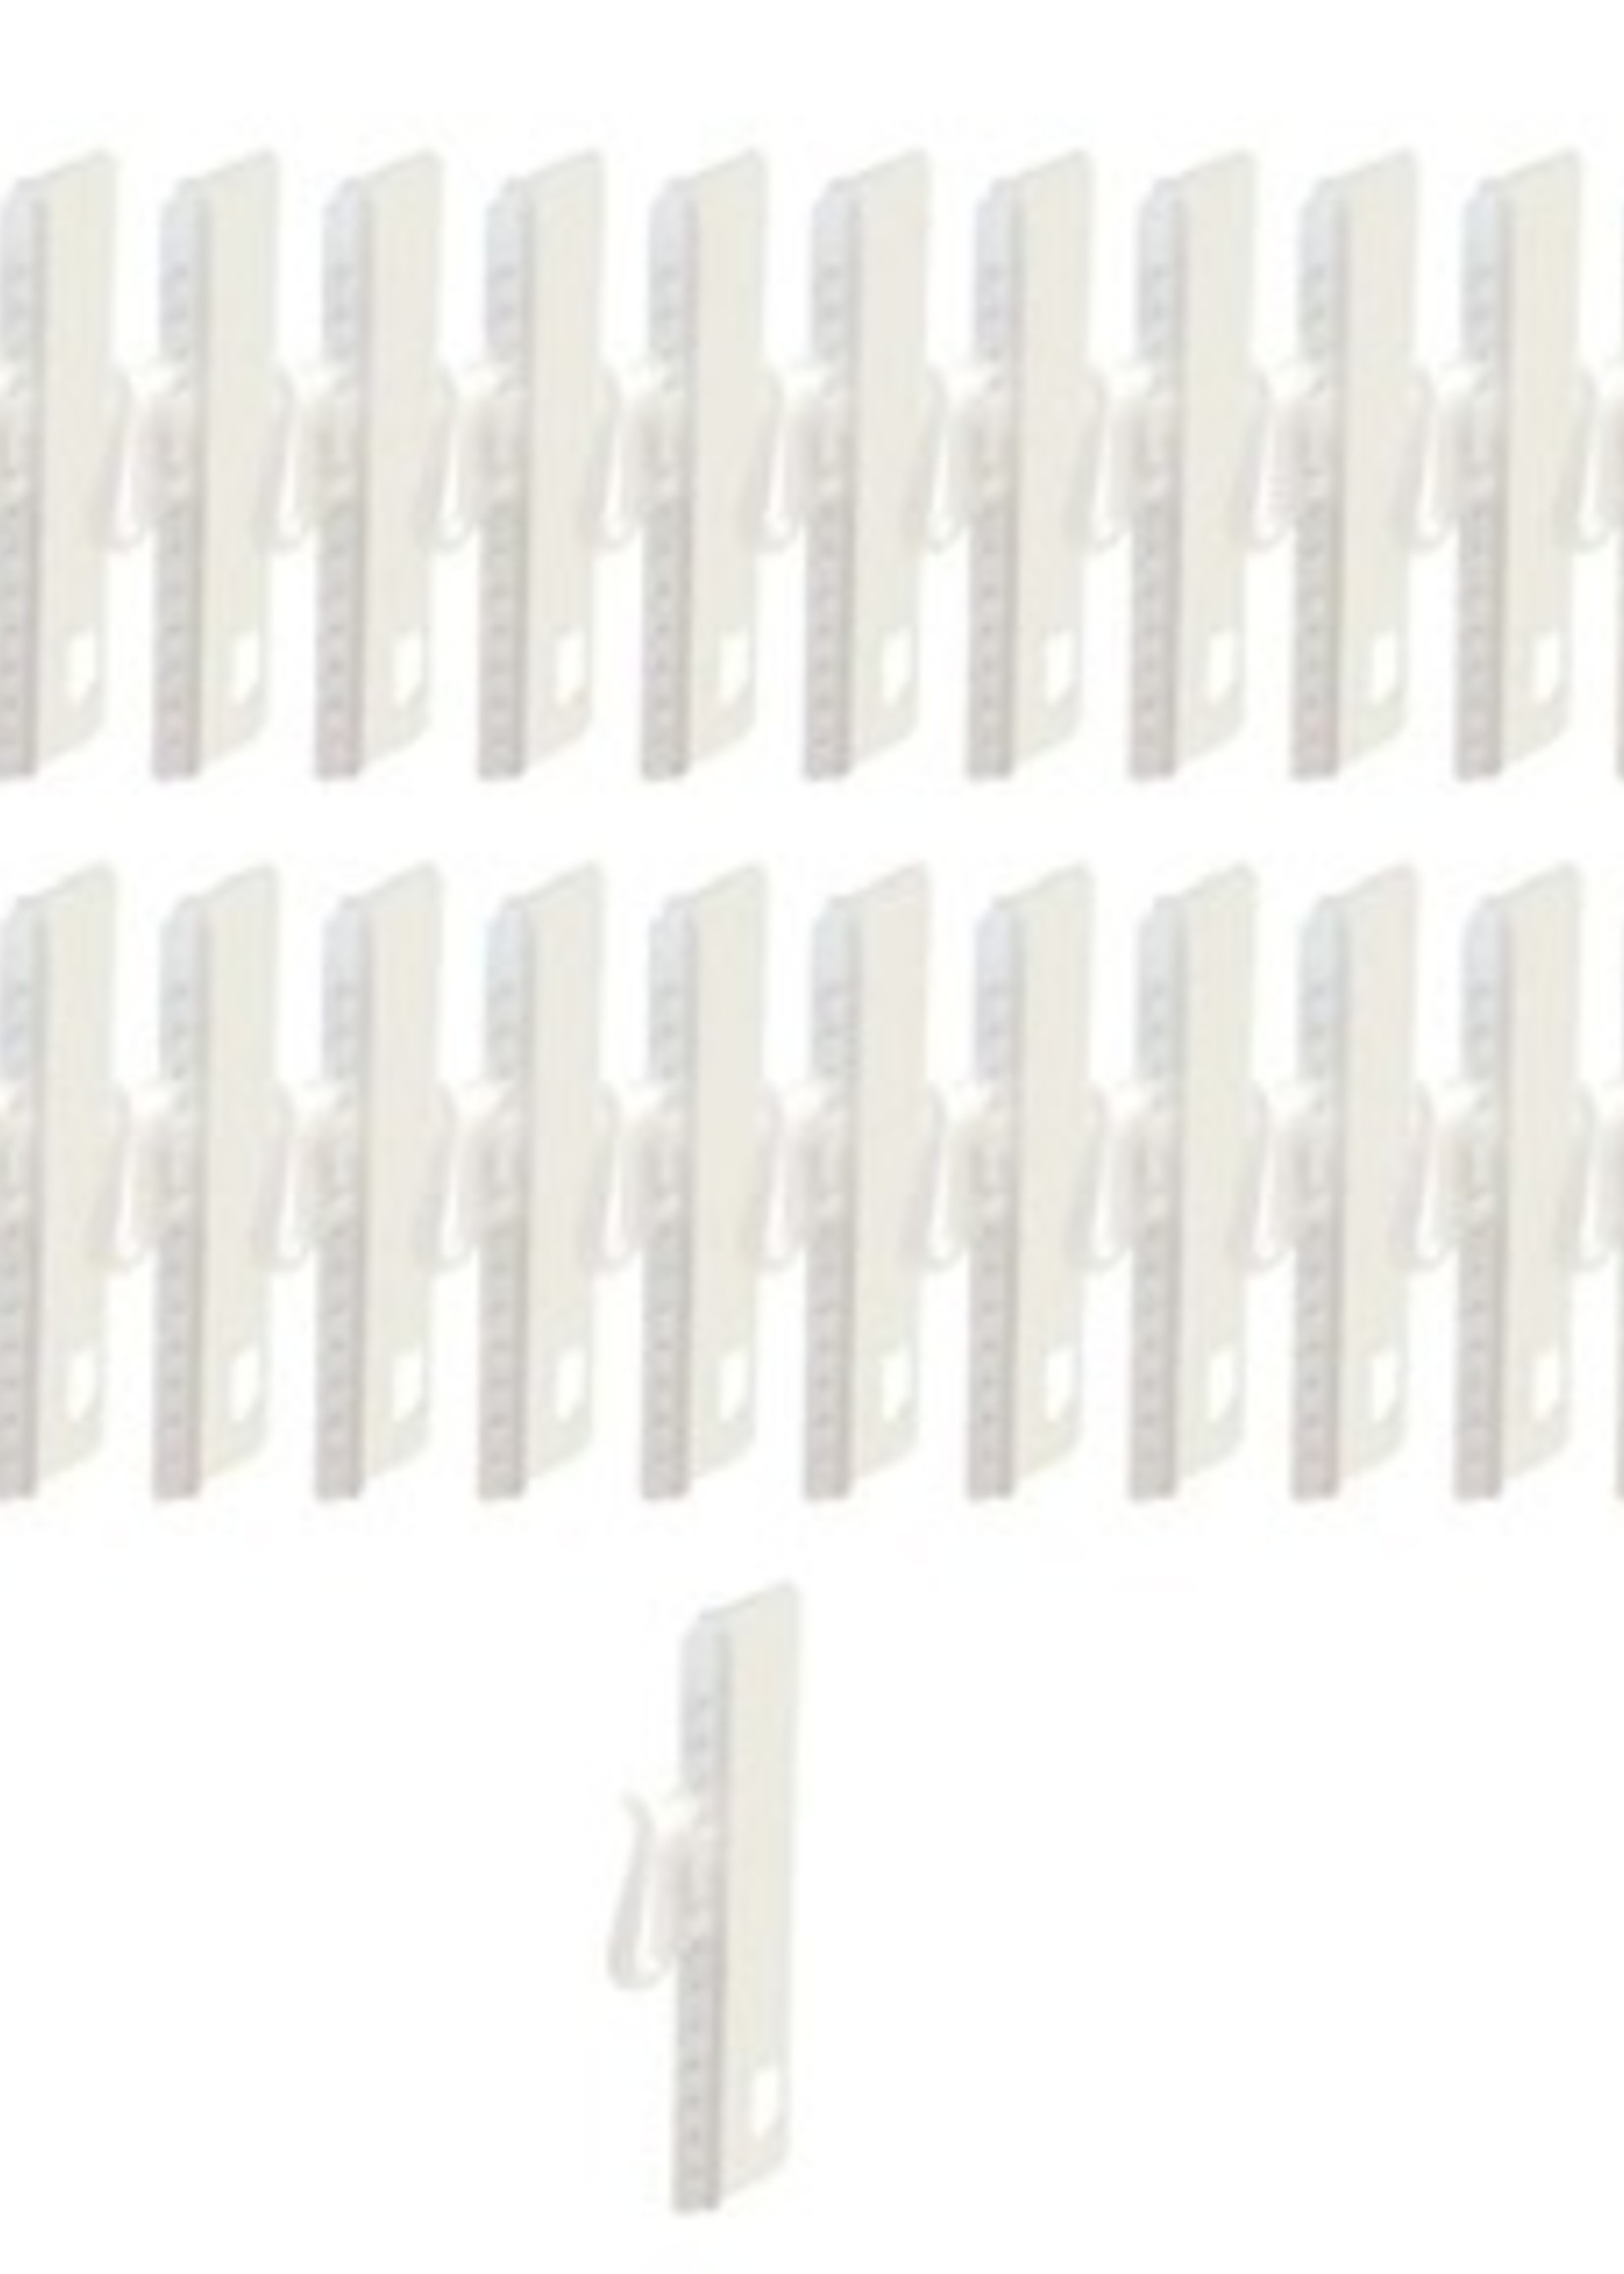 Mobyflex Innaai verstelbare gordijnhaak 7,5cm  verpakt per 20 stuks